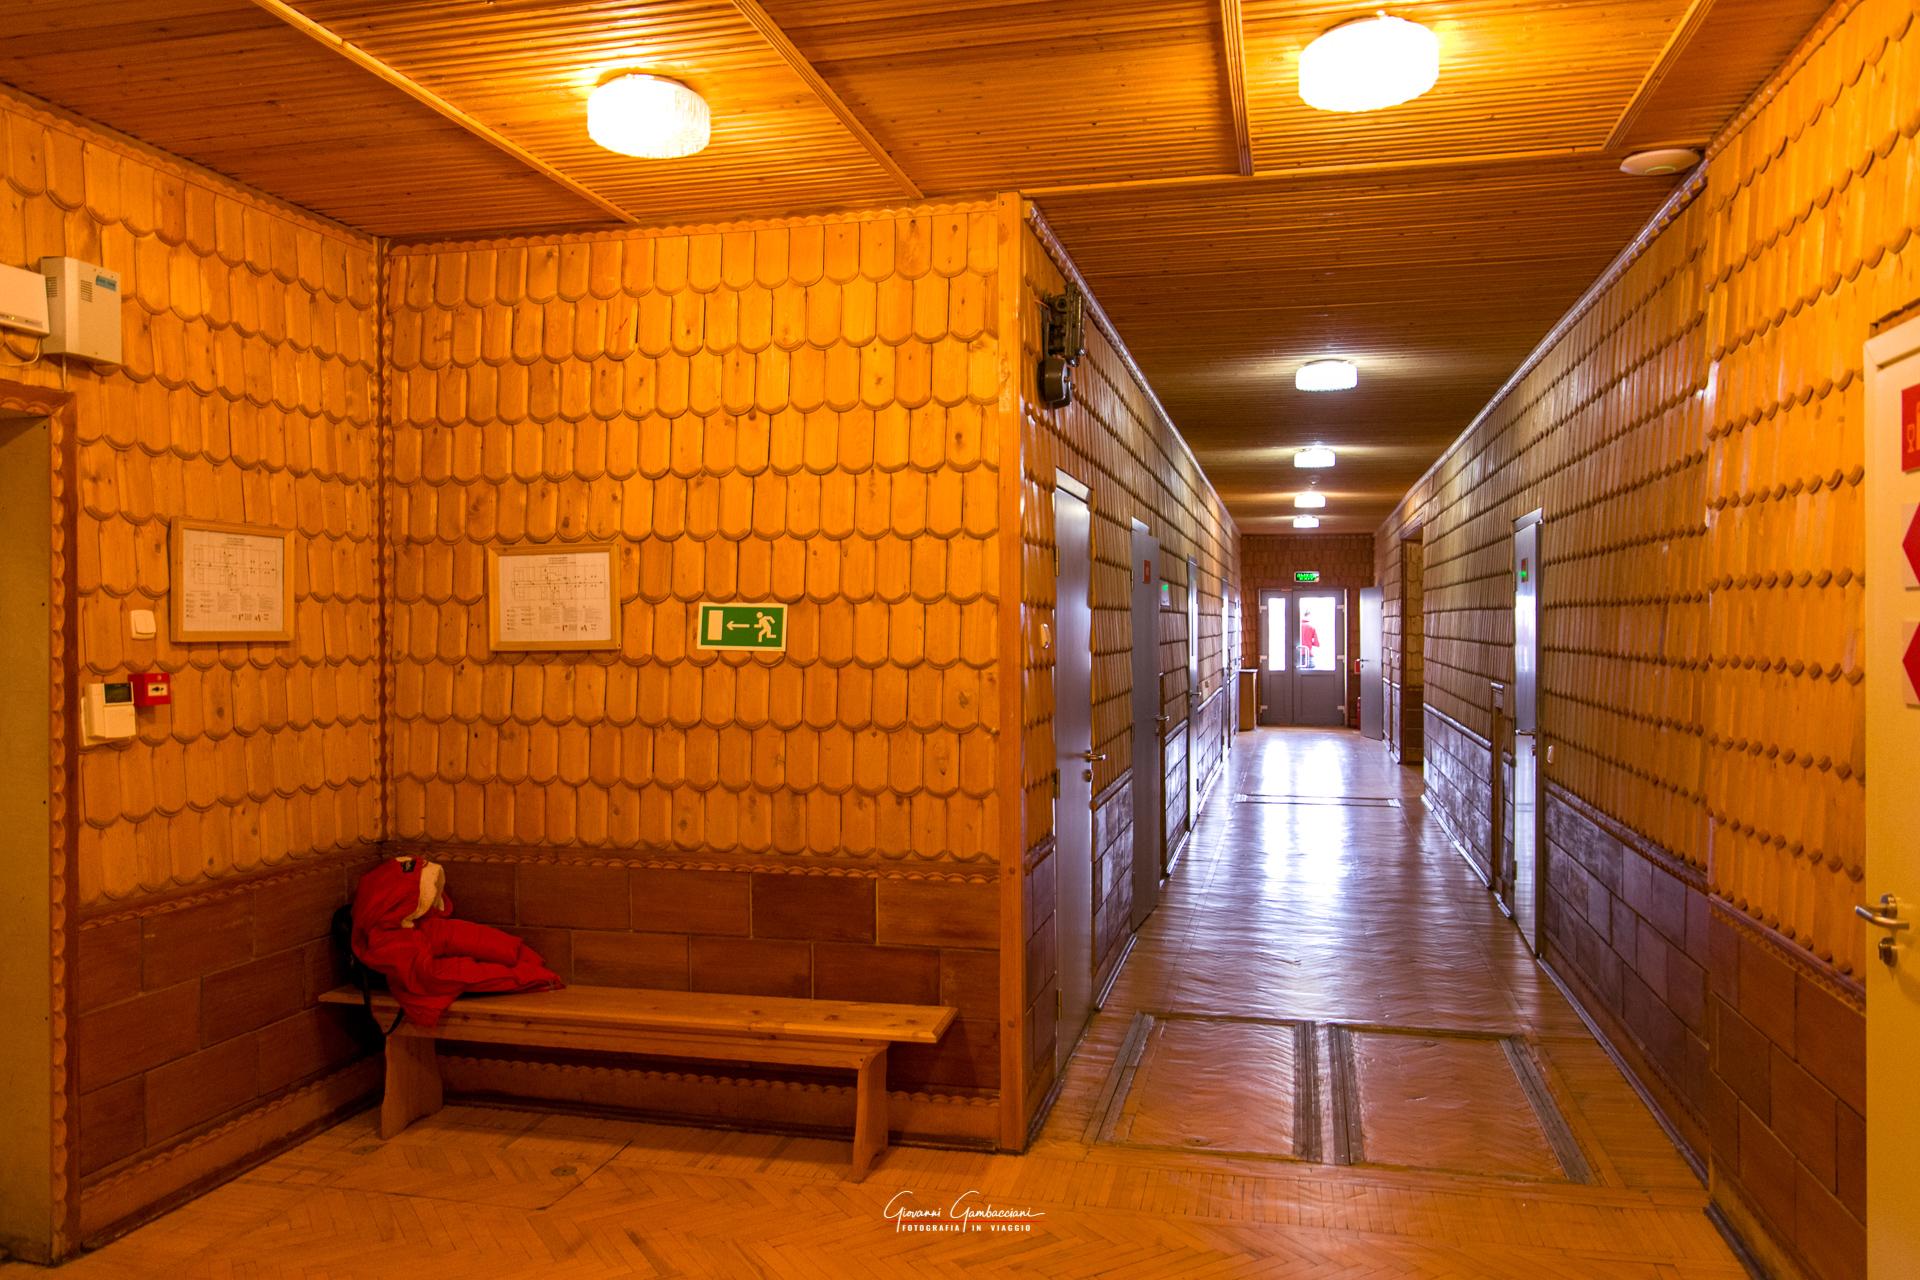 01_Svalbard_Pyramiden_Hotel-7